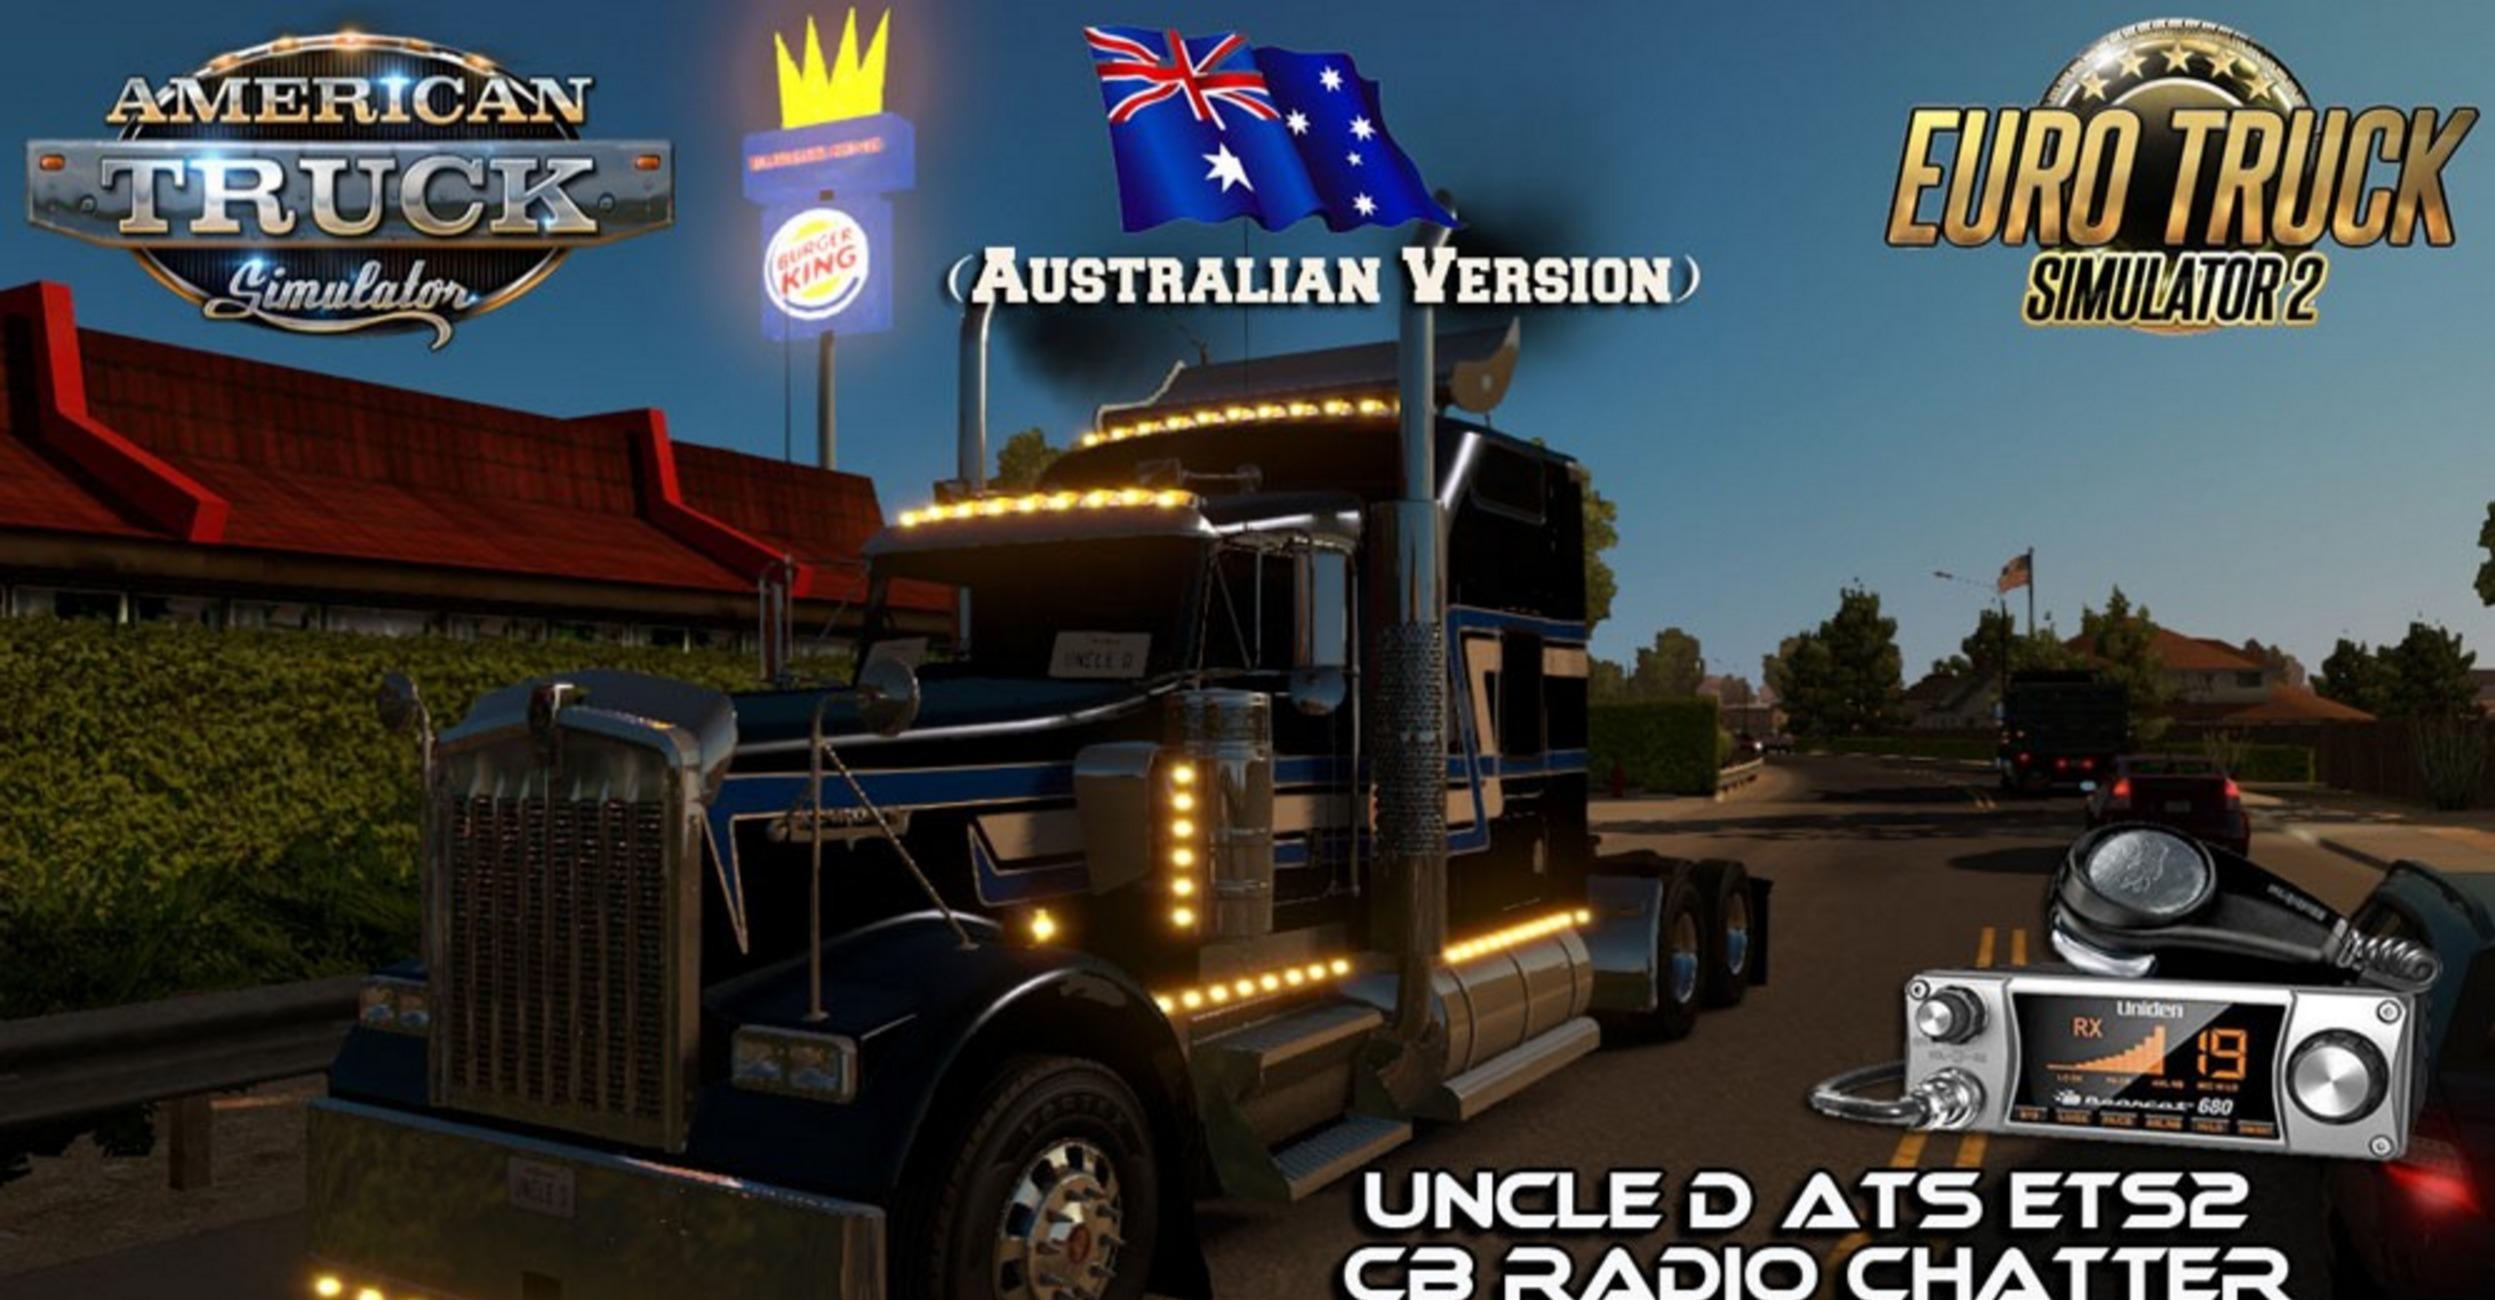 Uncle D ETS2 CB Radio Chatter v 2 04 (Australian Version